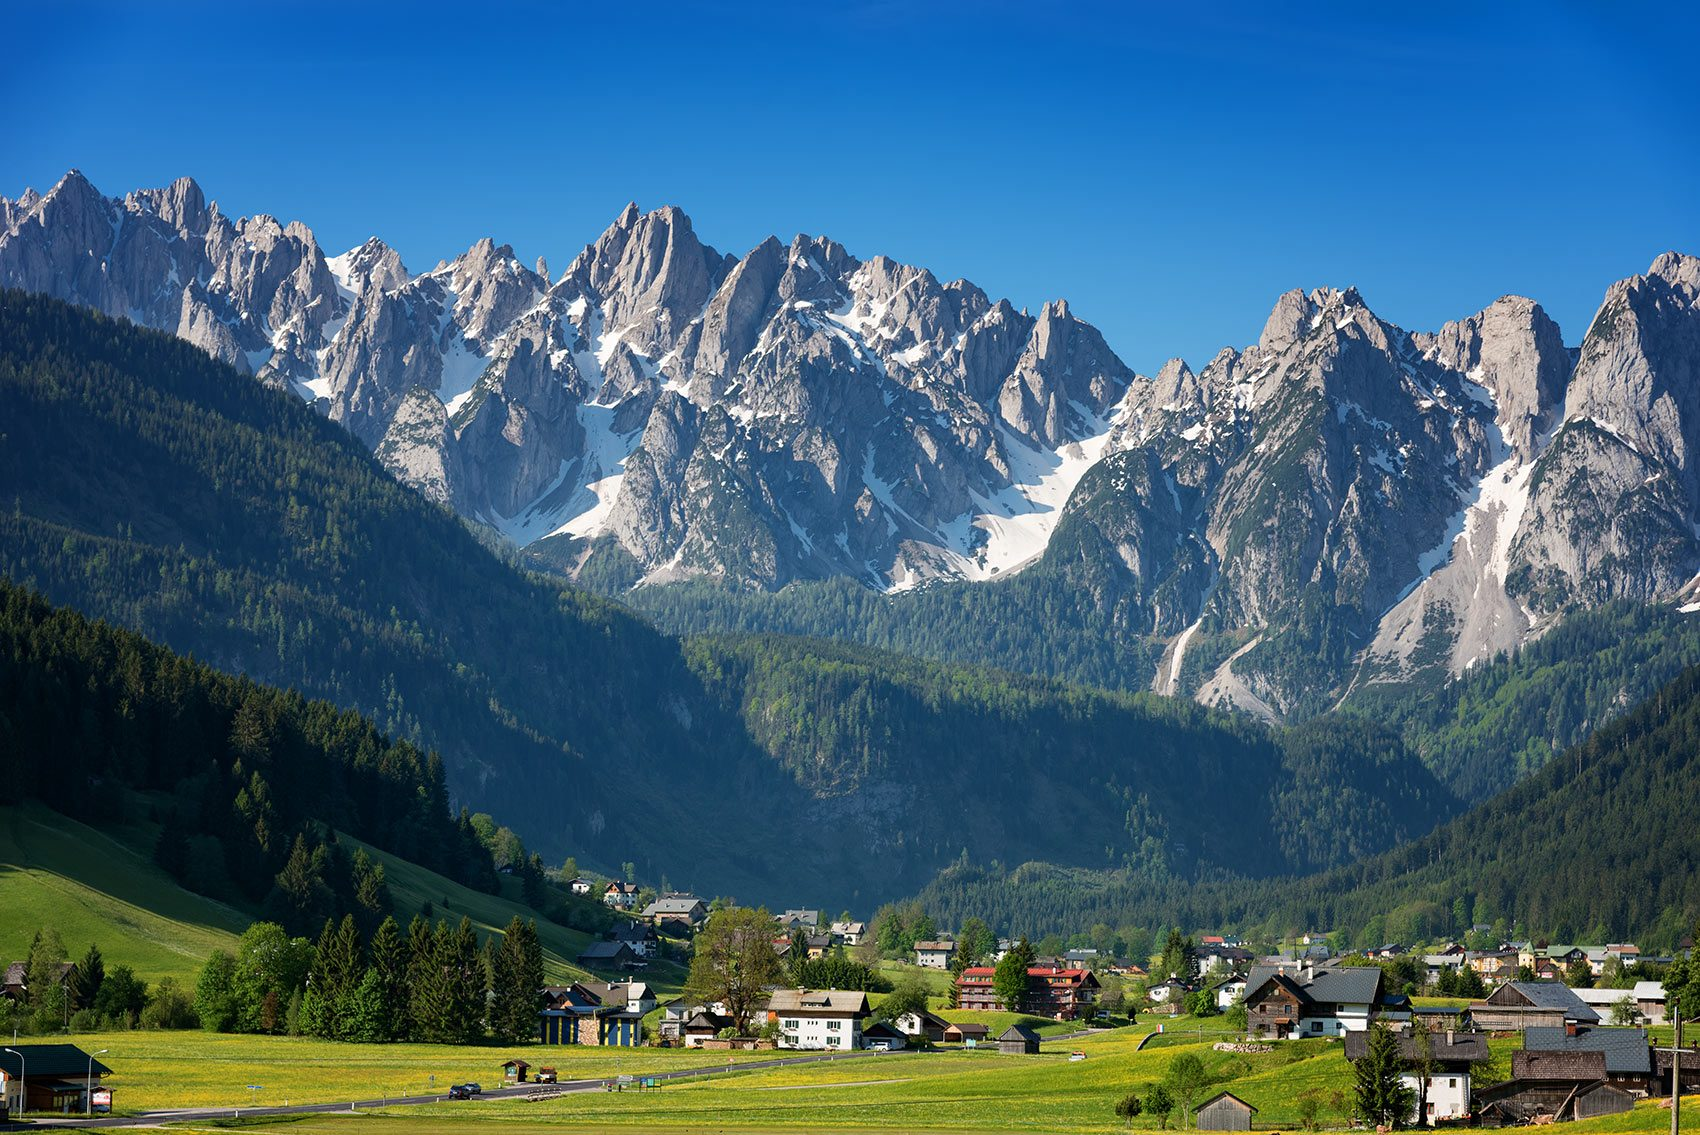 Bavaria Austrian Alps Amp Lake Constance Alps And Autobahns